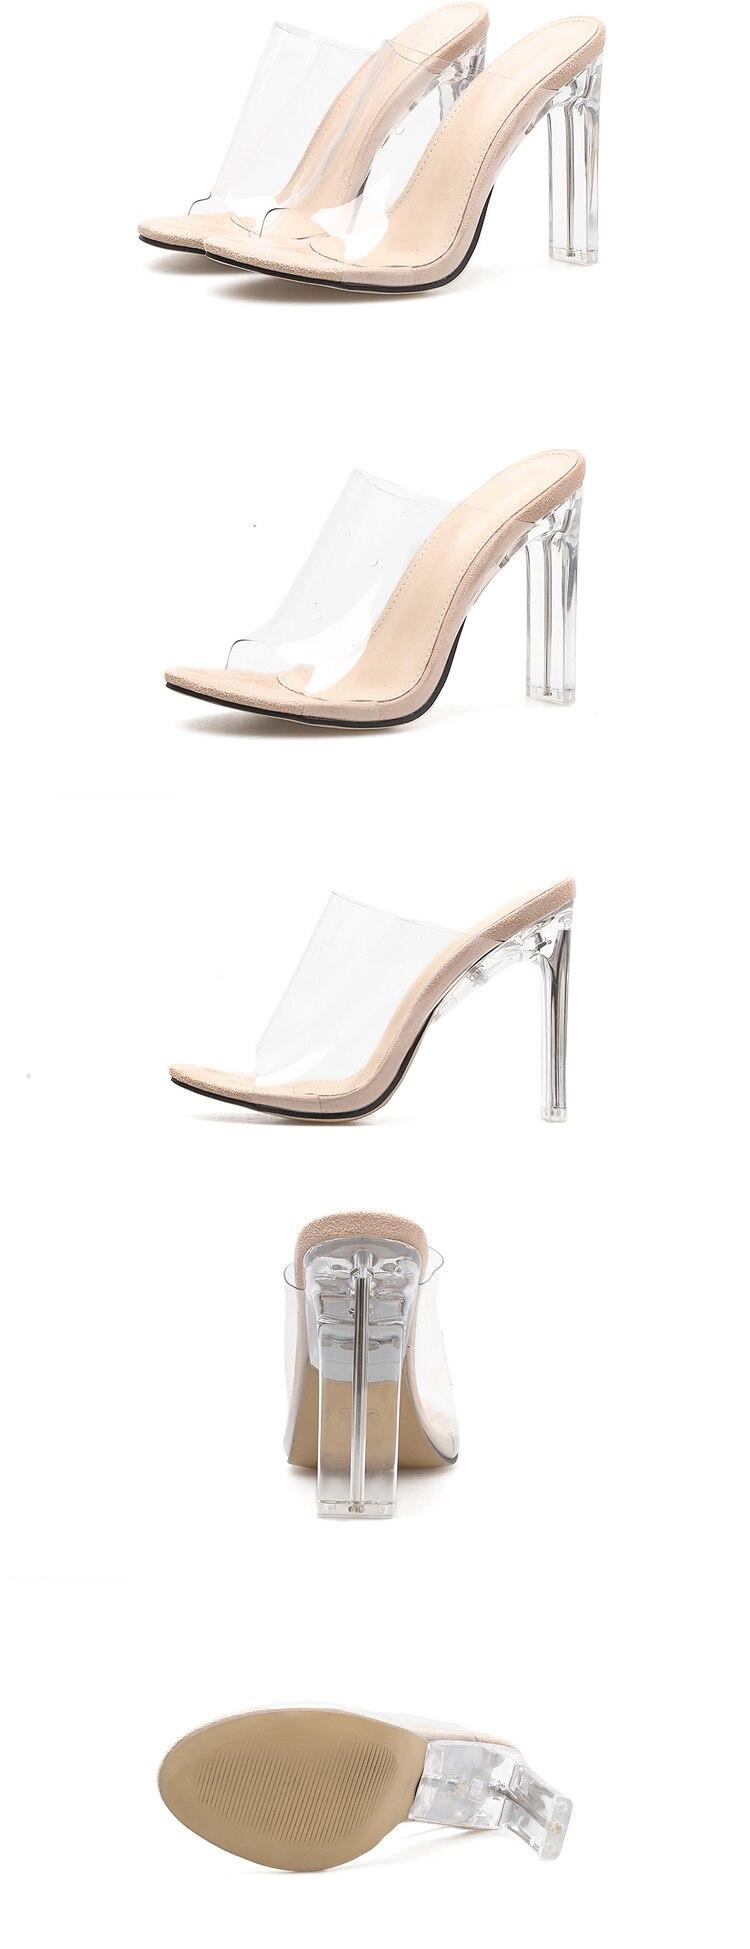 HTB1yNlBadzvK1RkSnfoq6zMwVXaE Aneikeh 2019 New PVC Jelly Sandals Crystal Open Toed Sexy Thin Heels Crystal Women Transparent Heel Sandals Slippers Pumps